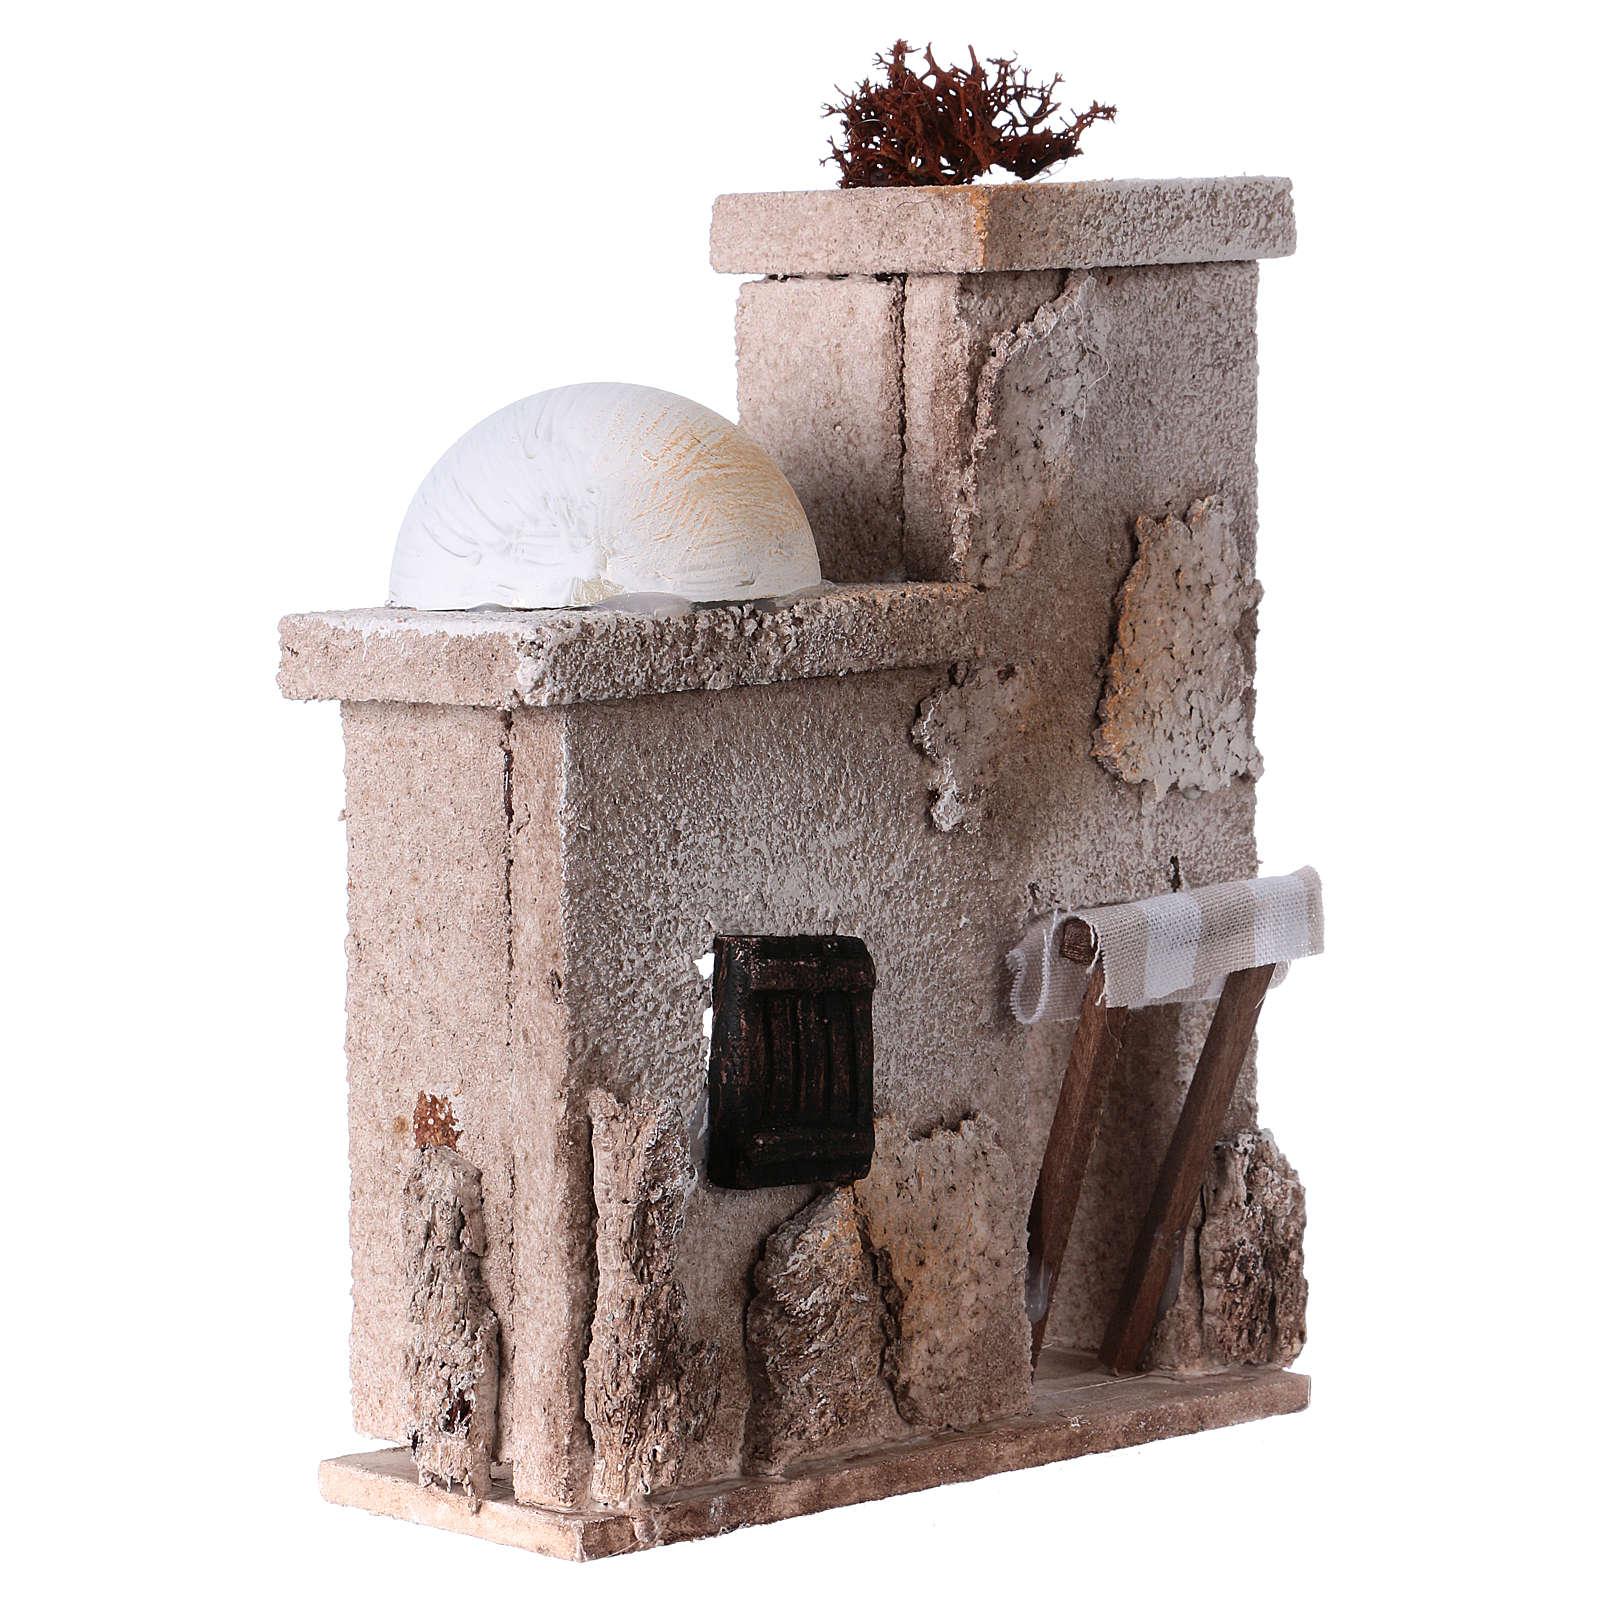 Small Arab house 15x15x5 cm for 7 cm nativity scene 4